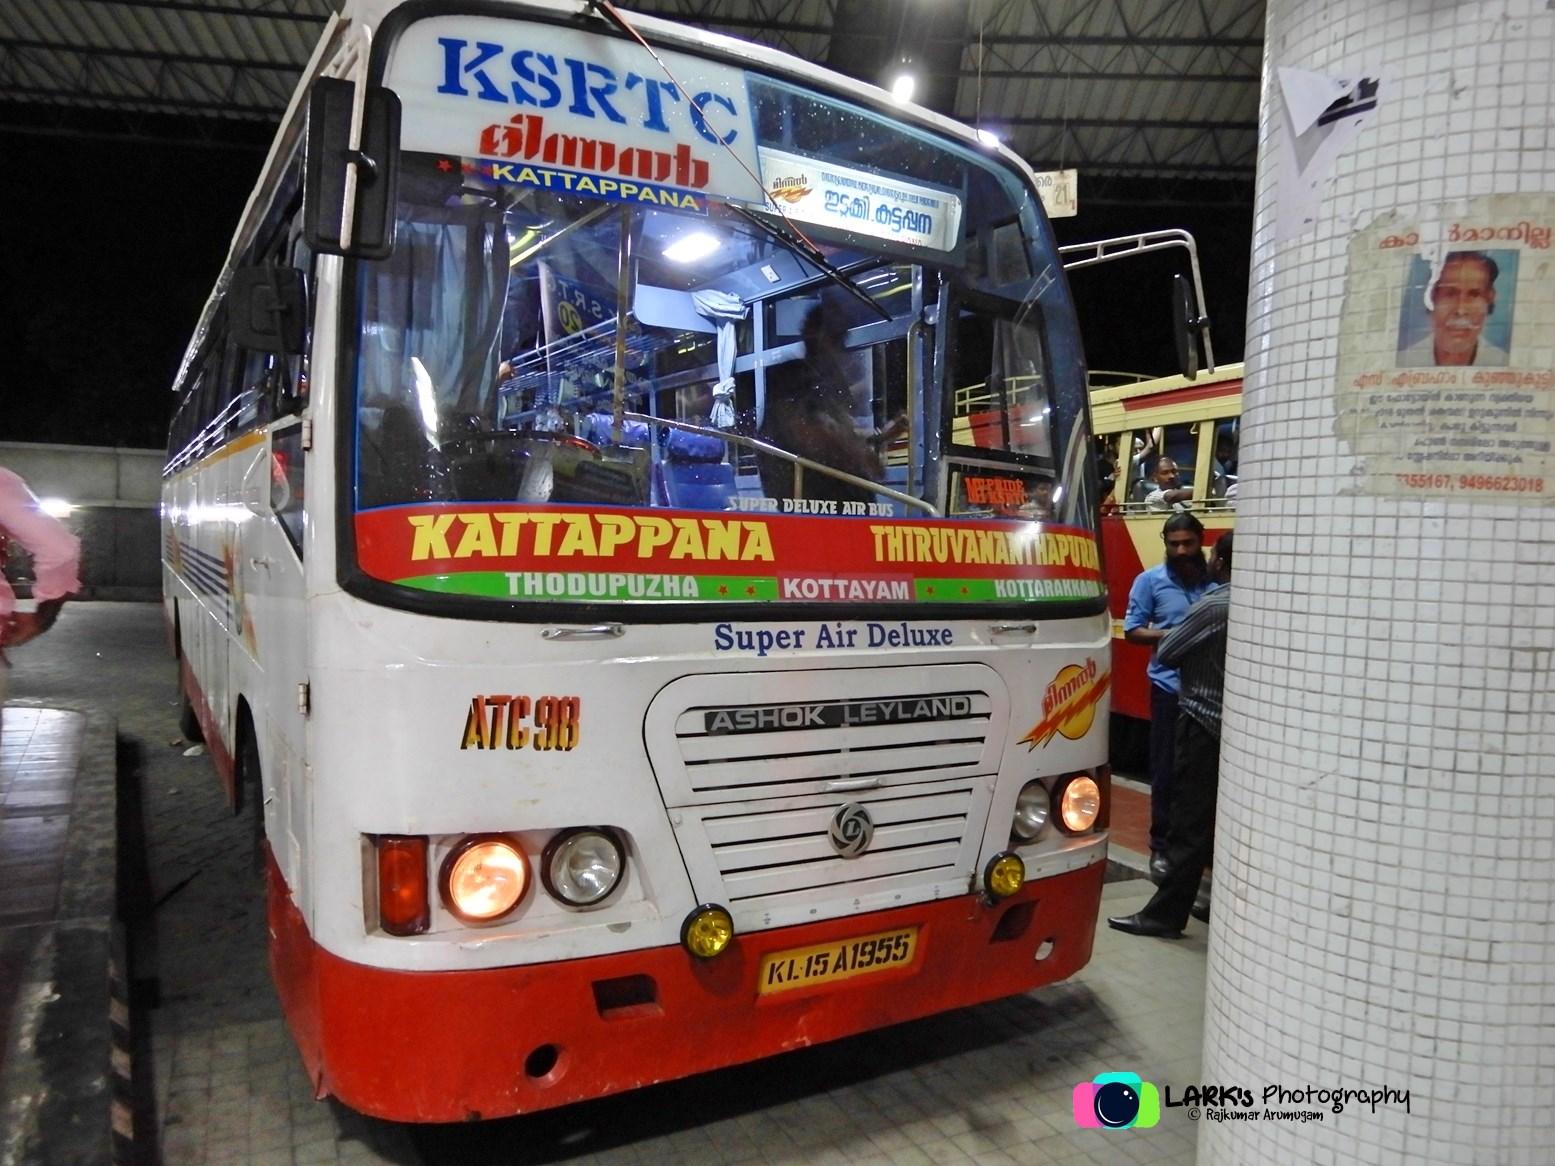 KSRTC – Thiruvananthapuram – Kattappana – [ATC98] – Ticket to Get Lost